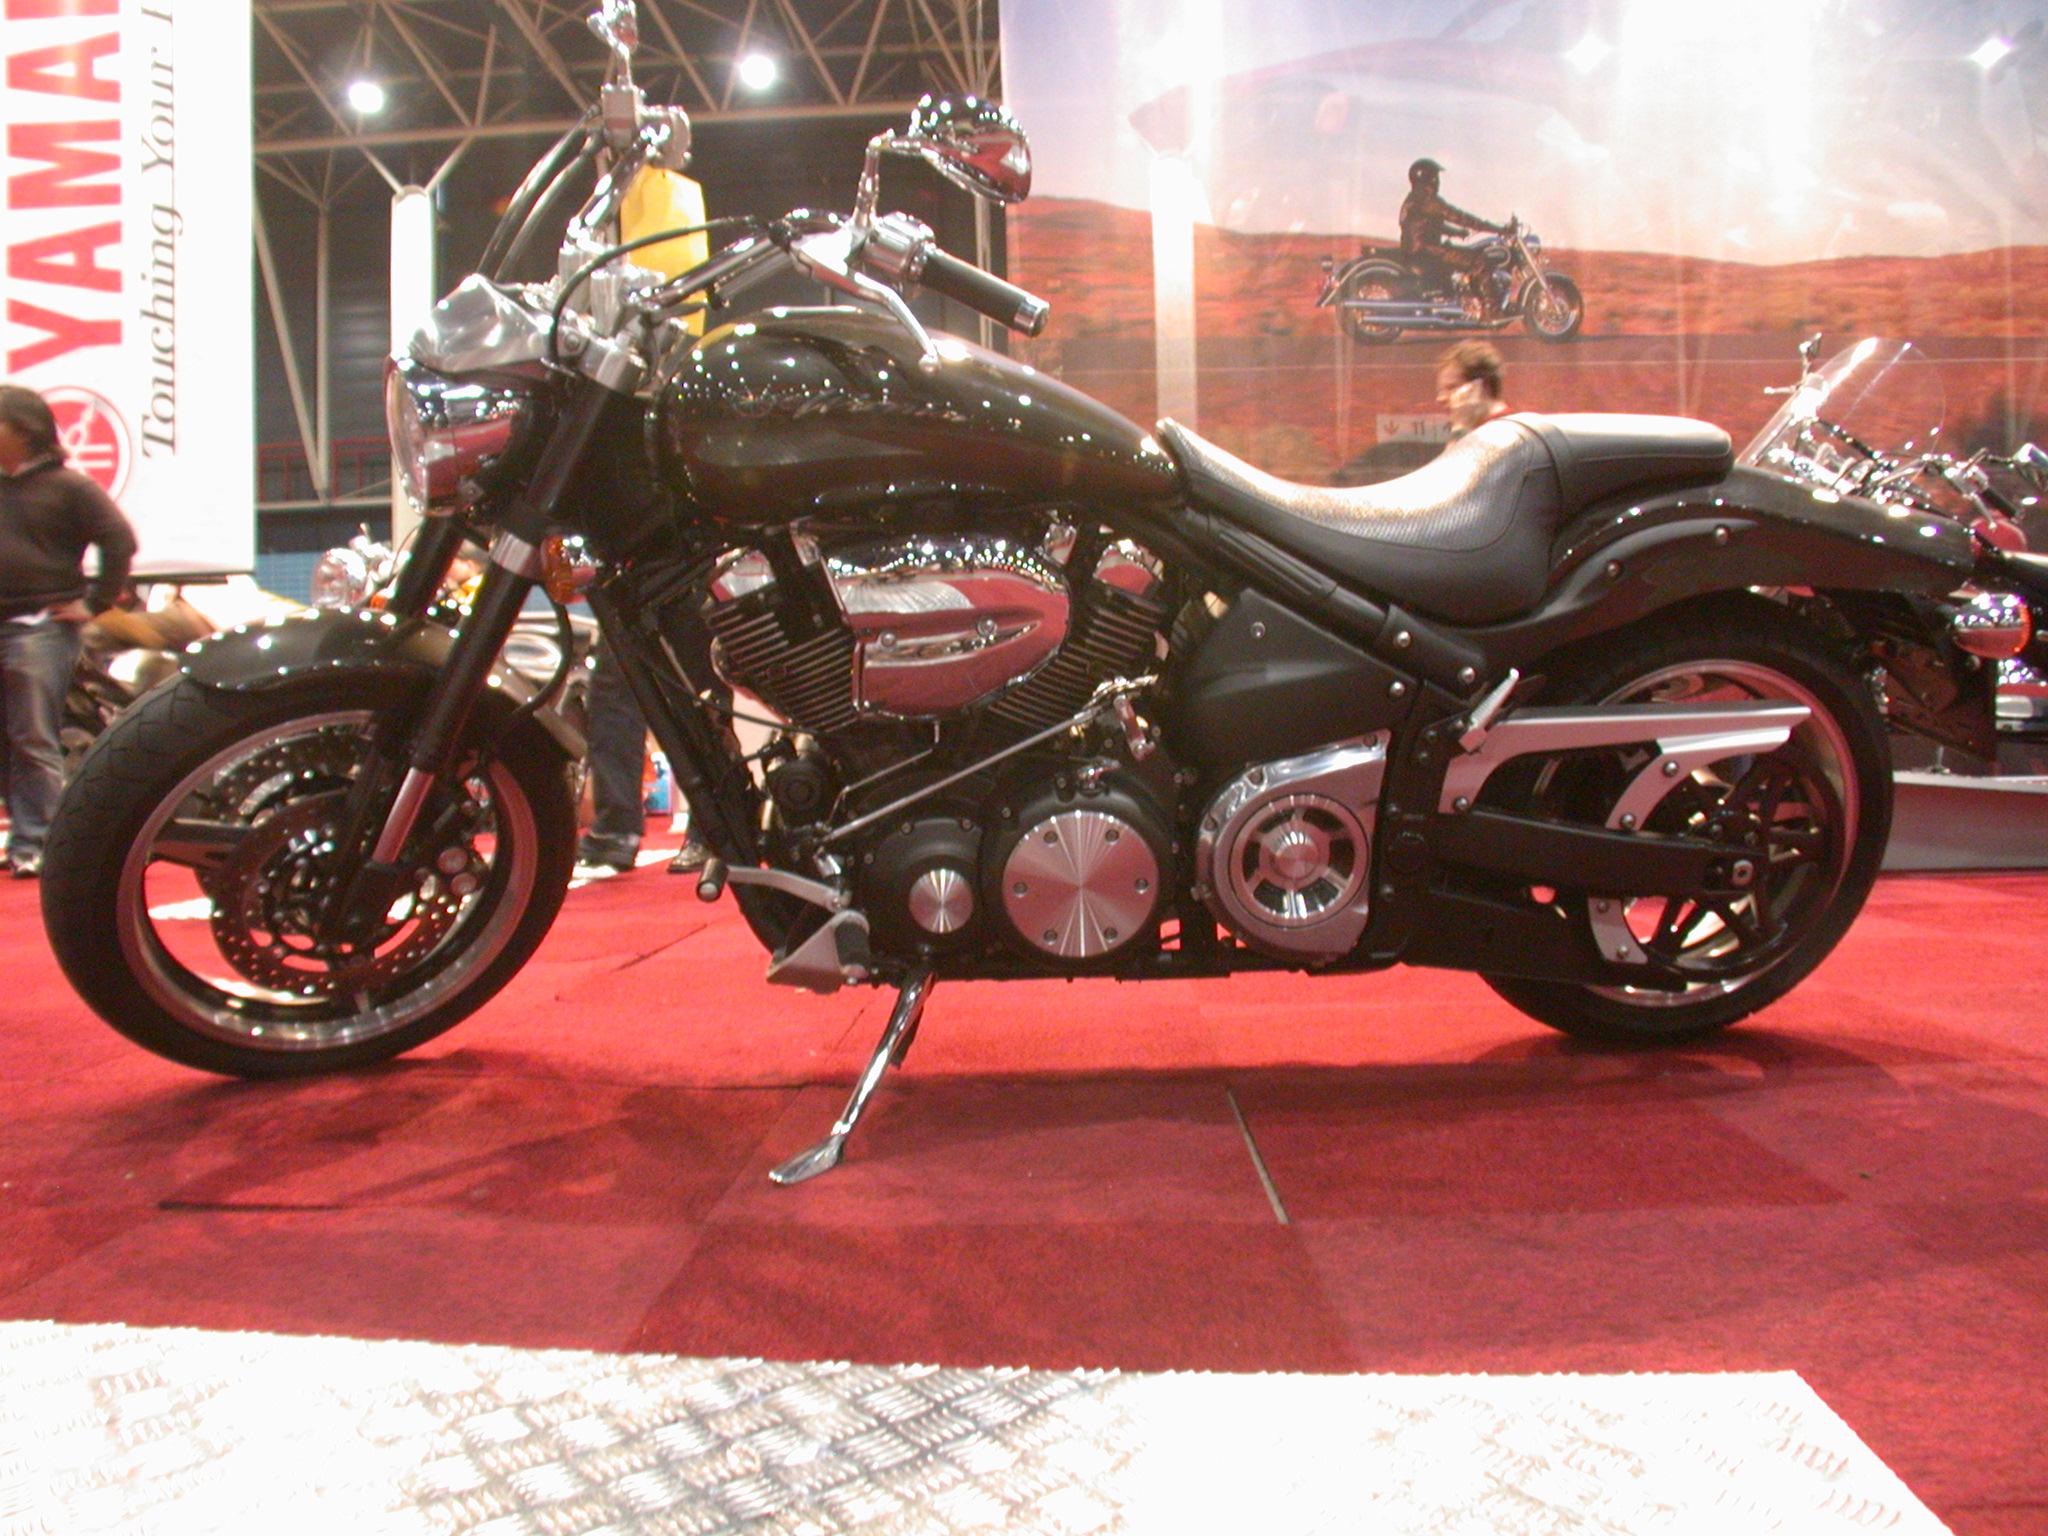 motor motorbike showroom show bike shiny